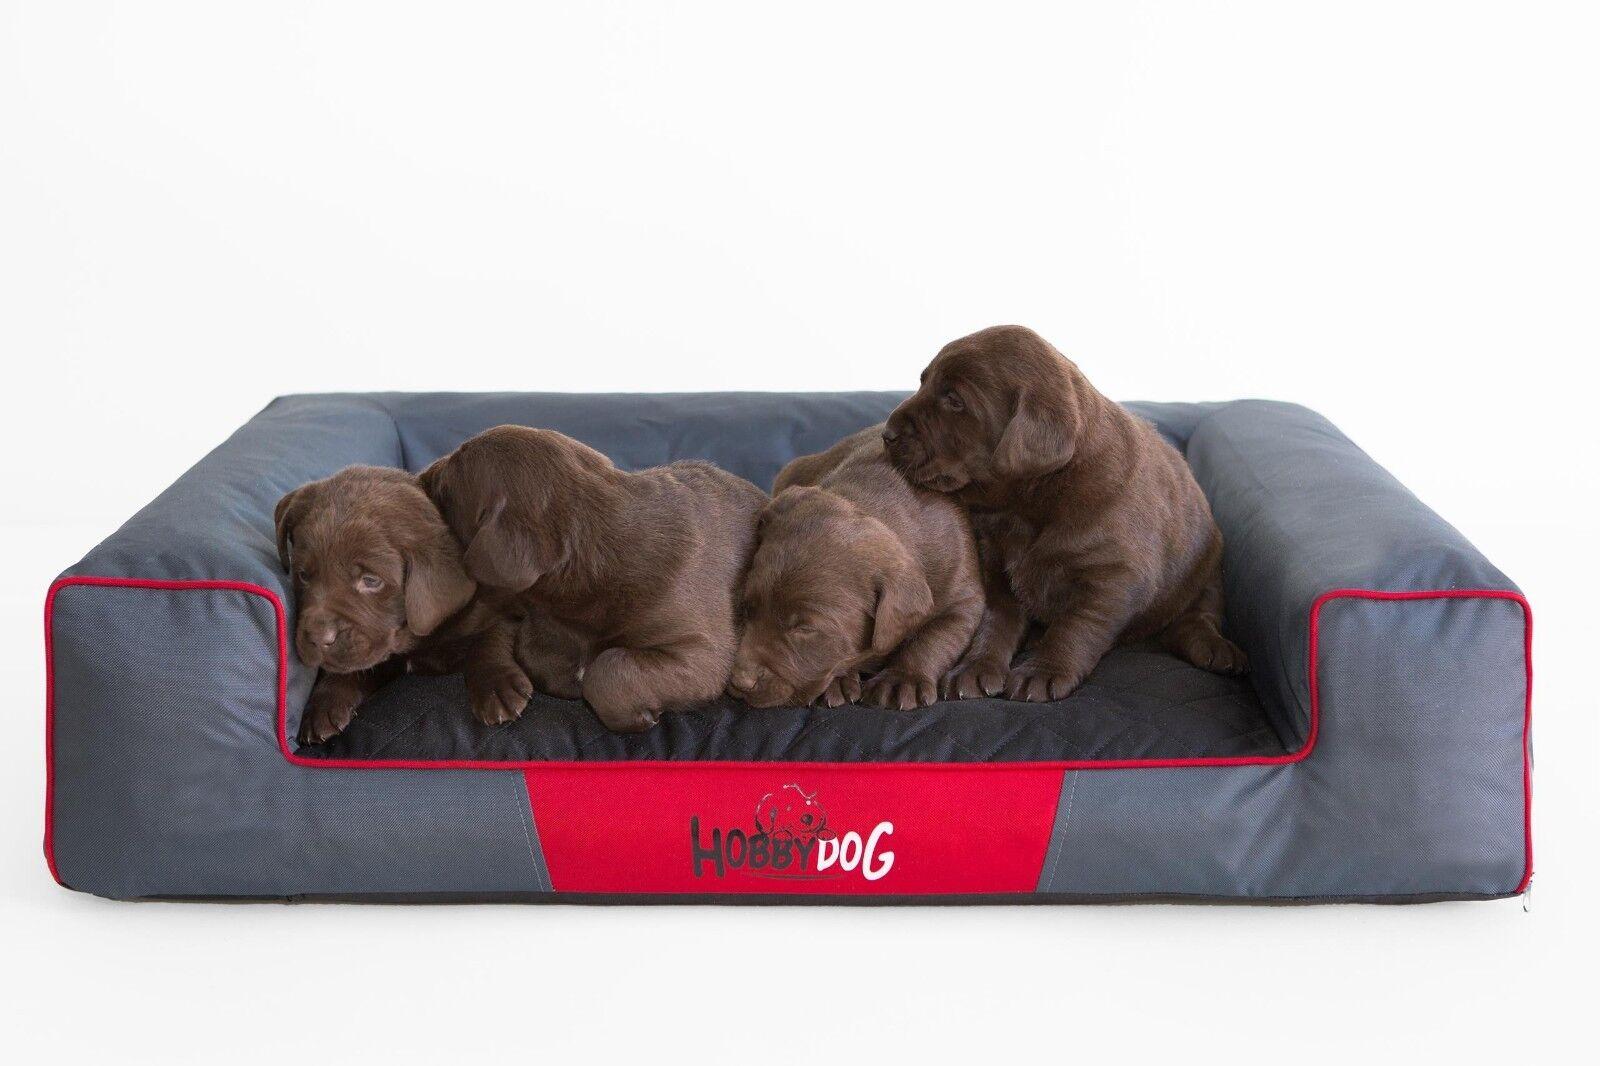 Bed Dog Victoria Puppy XXL Hobbydog Puppies Sofa with Warm Cosy Thick Mattress